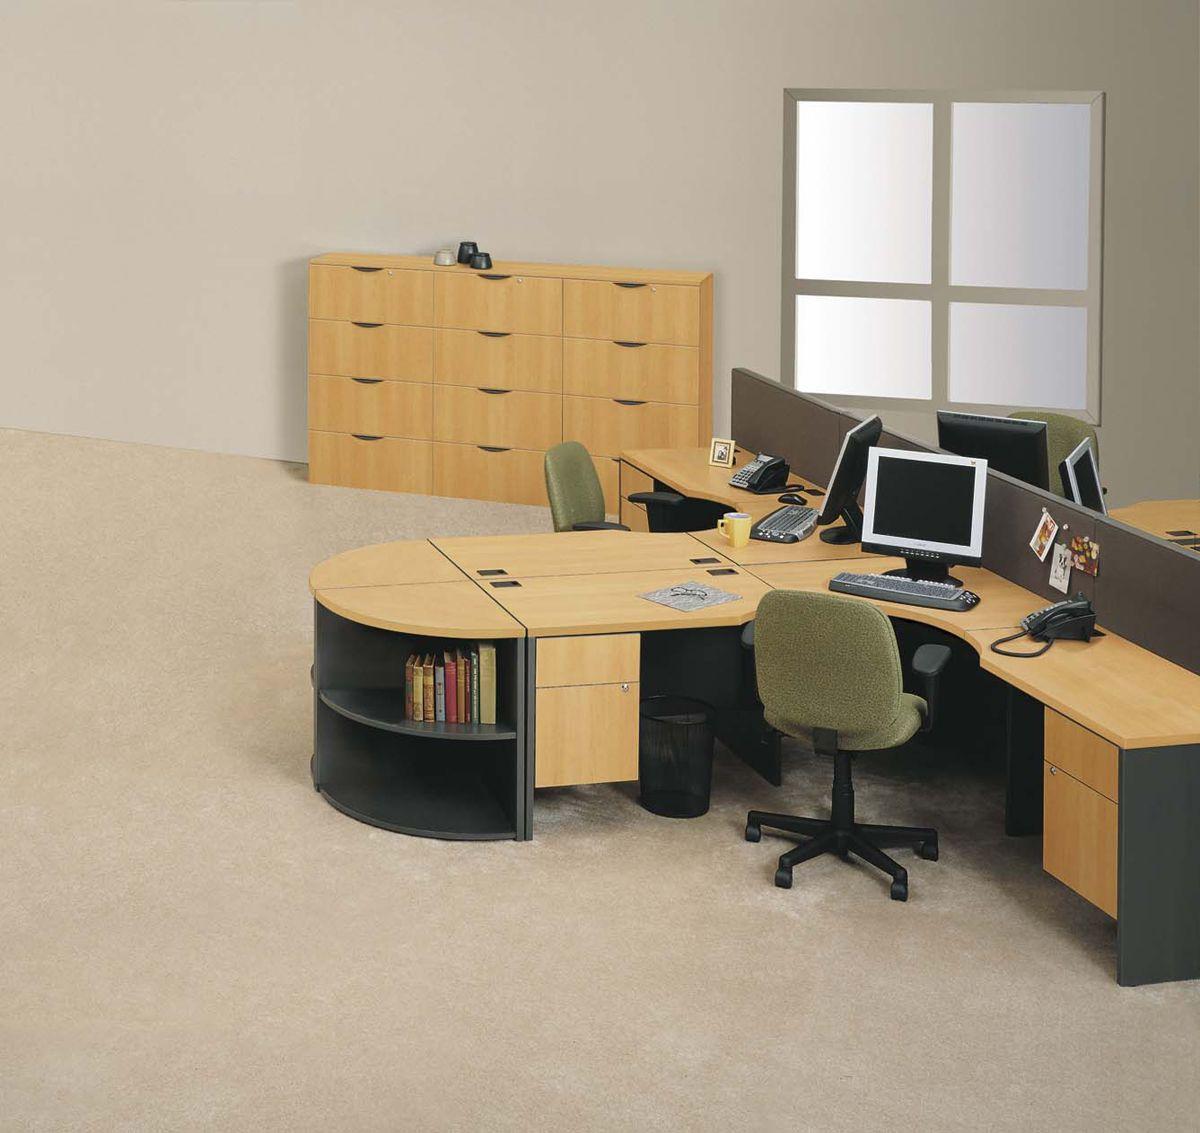 Büromöbel Nächsten Office Möbel | BüroMöbel | Pinterest